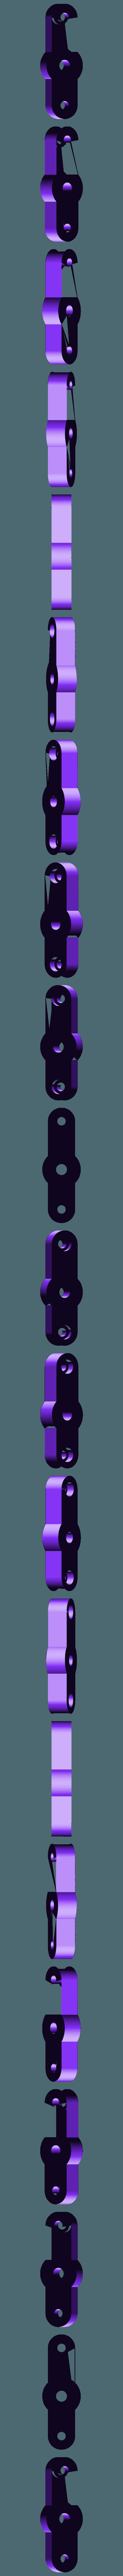 Geared_Extrude_universal_bracket_8mm.stl Download free STL file FDM Printer de Kleine Reus 300x300x900 • 3D printable object, Job